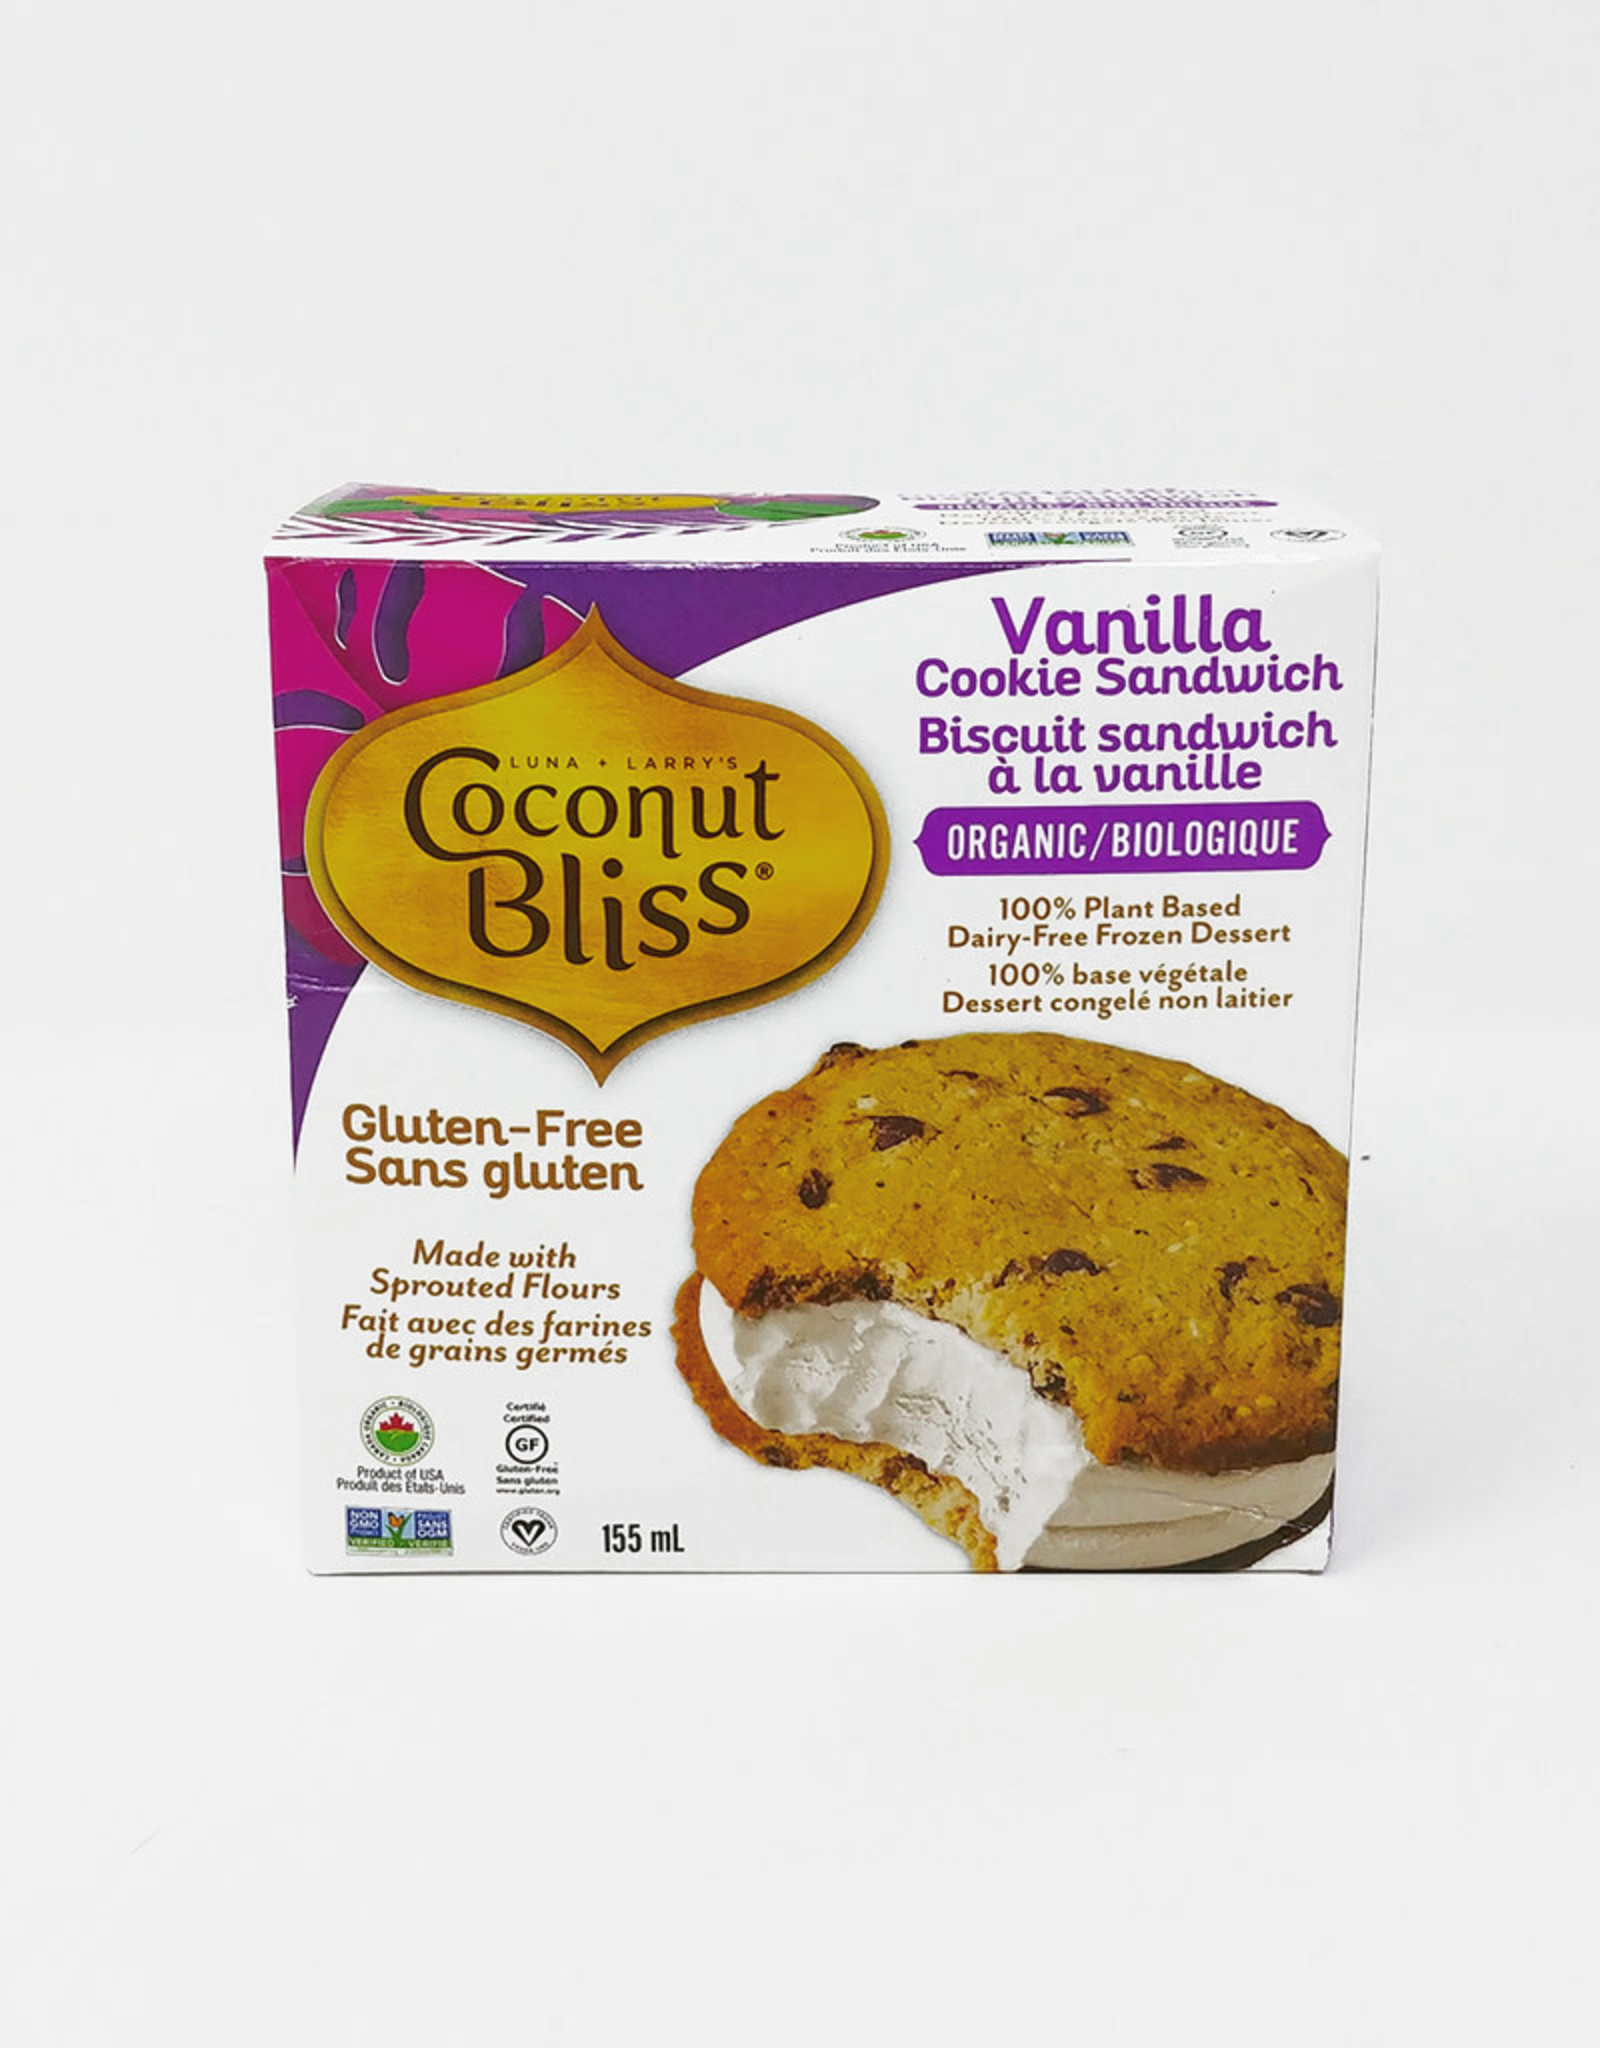 Coconut Bliss Coconut Bliss - Cookie Sandwich, Vanilla